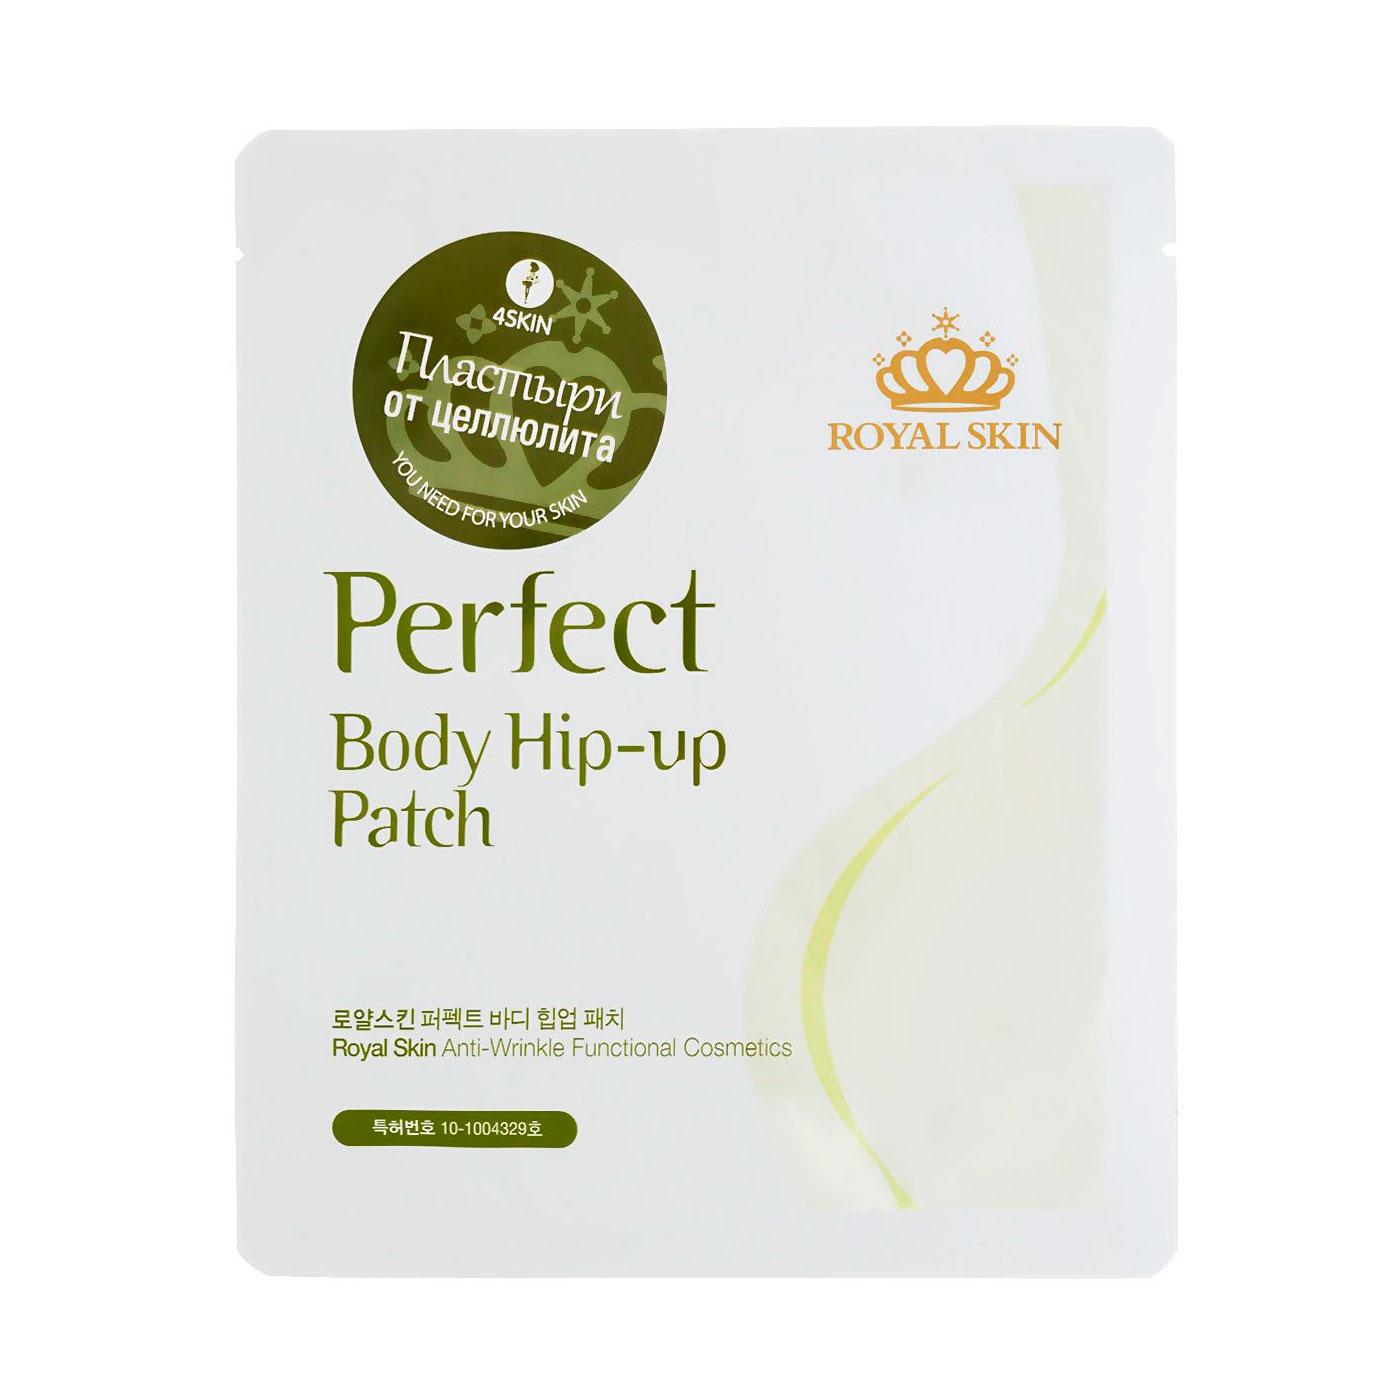 Патчи-маски Royal Skin 2 шт от целлюлита и для увеличения эластичности кожи бедер<br>